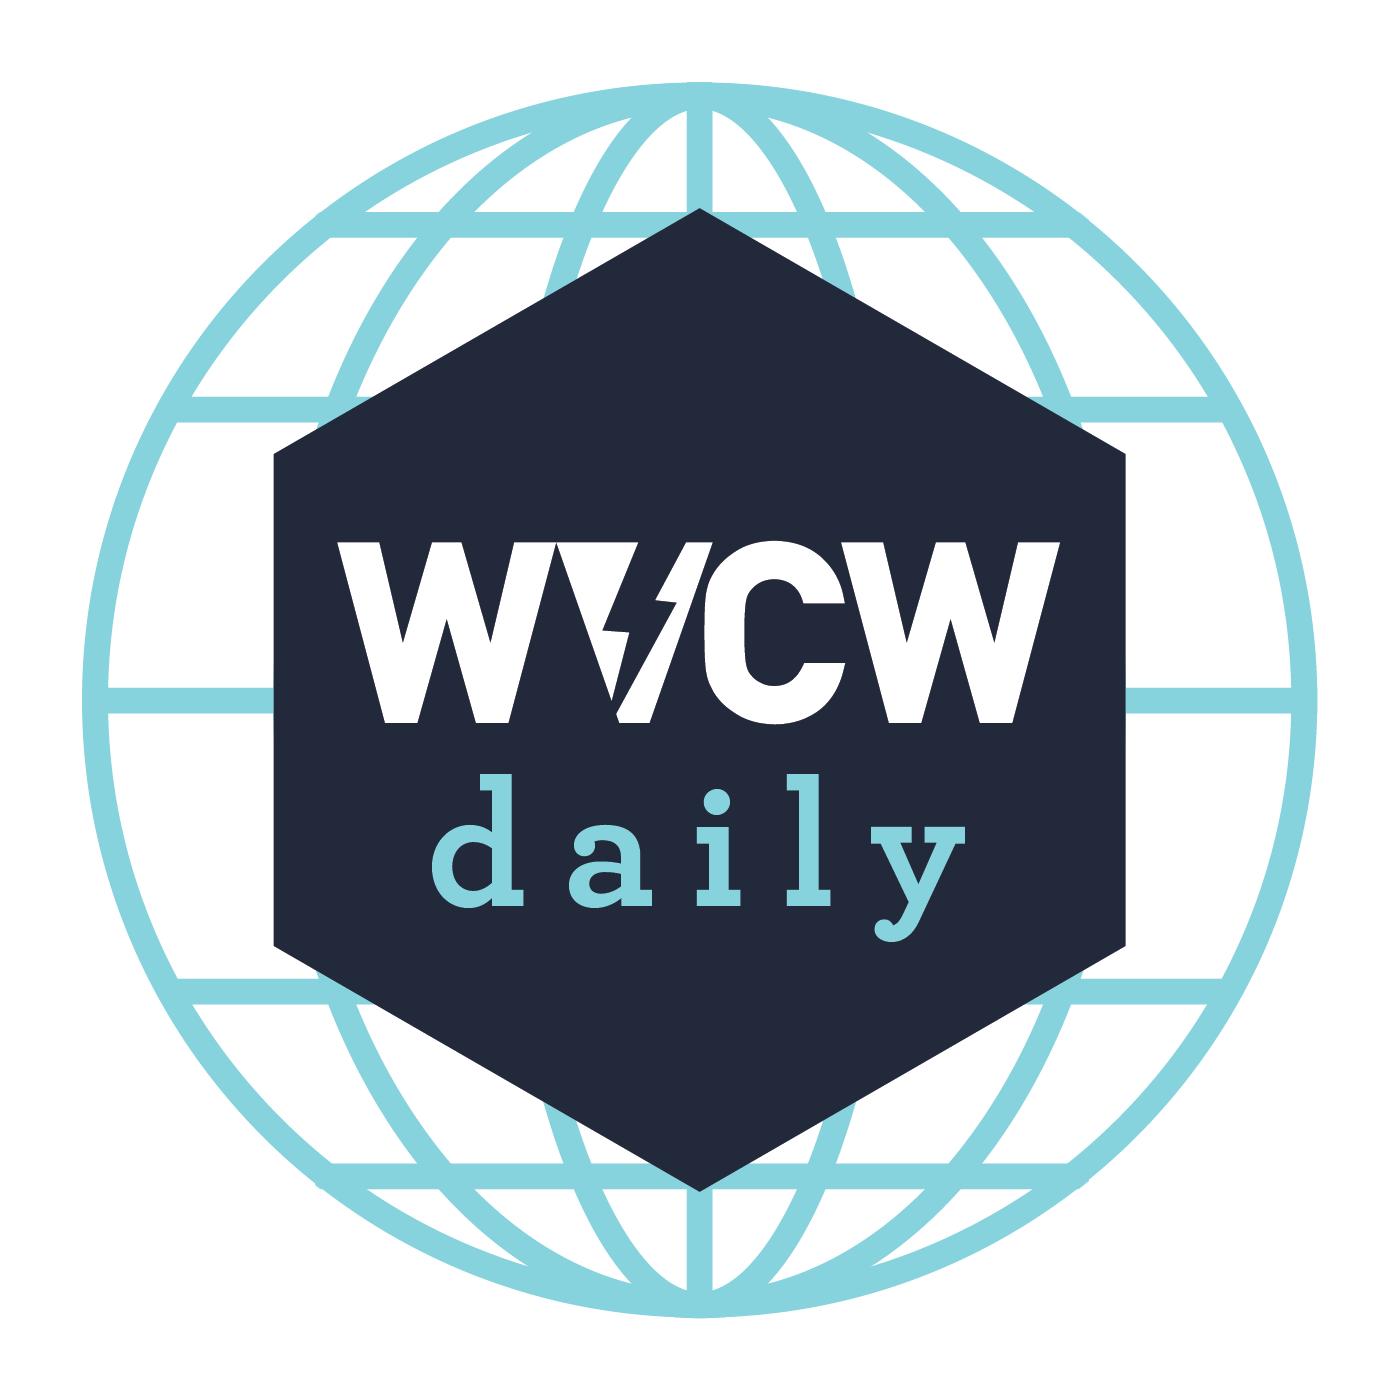 WVCW News Headlines